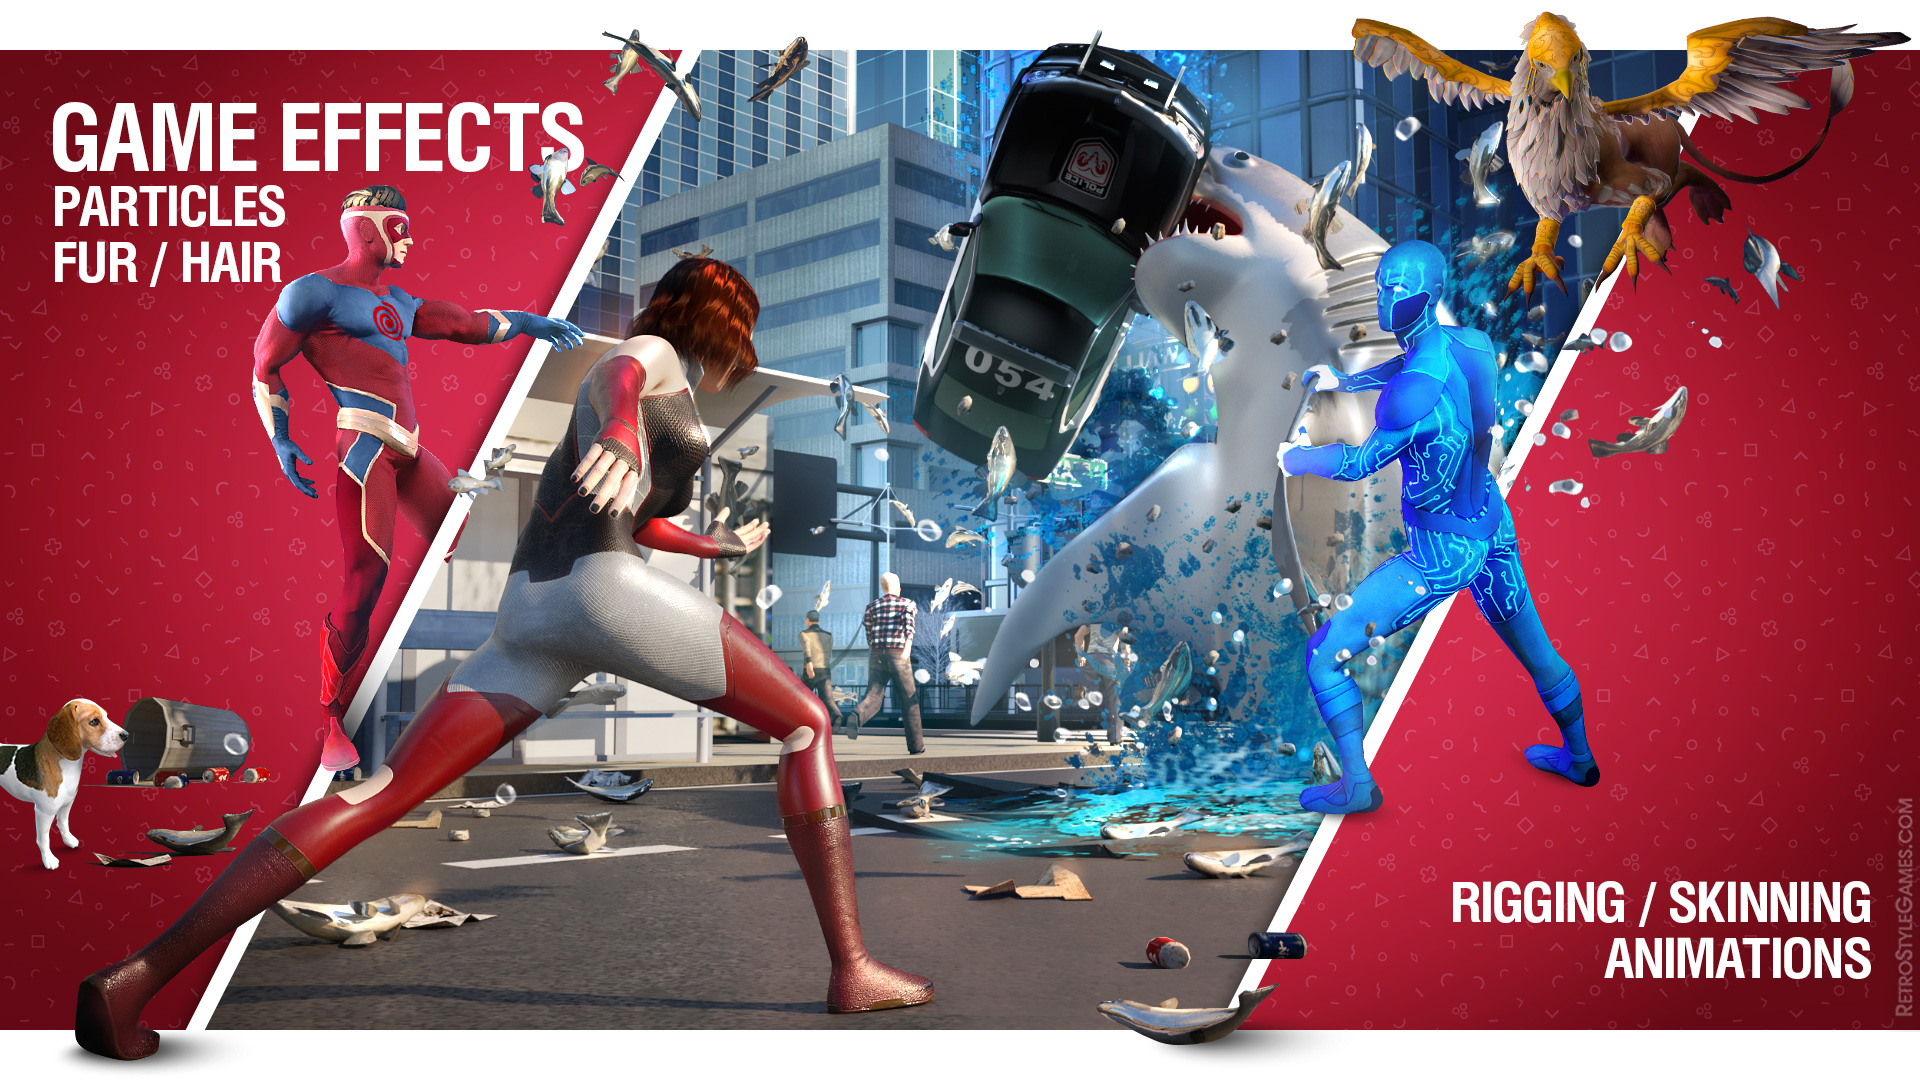 Game FX Effects Rigging Skinning Animation Ragdoll Simulation